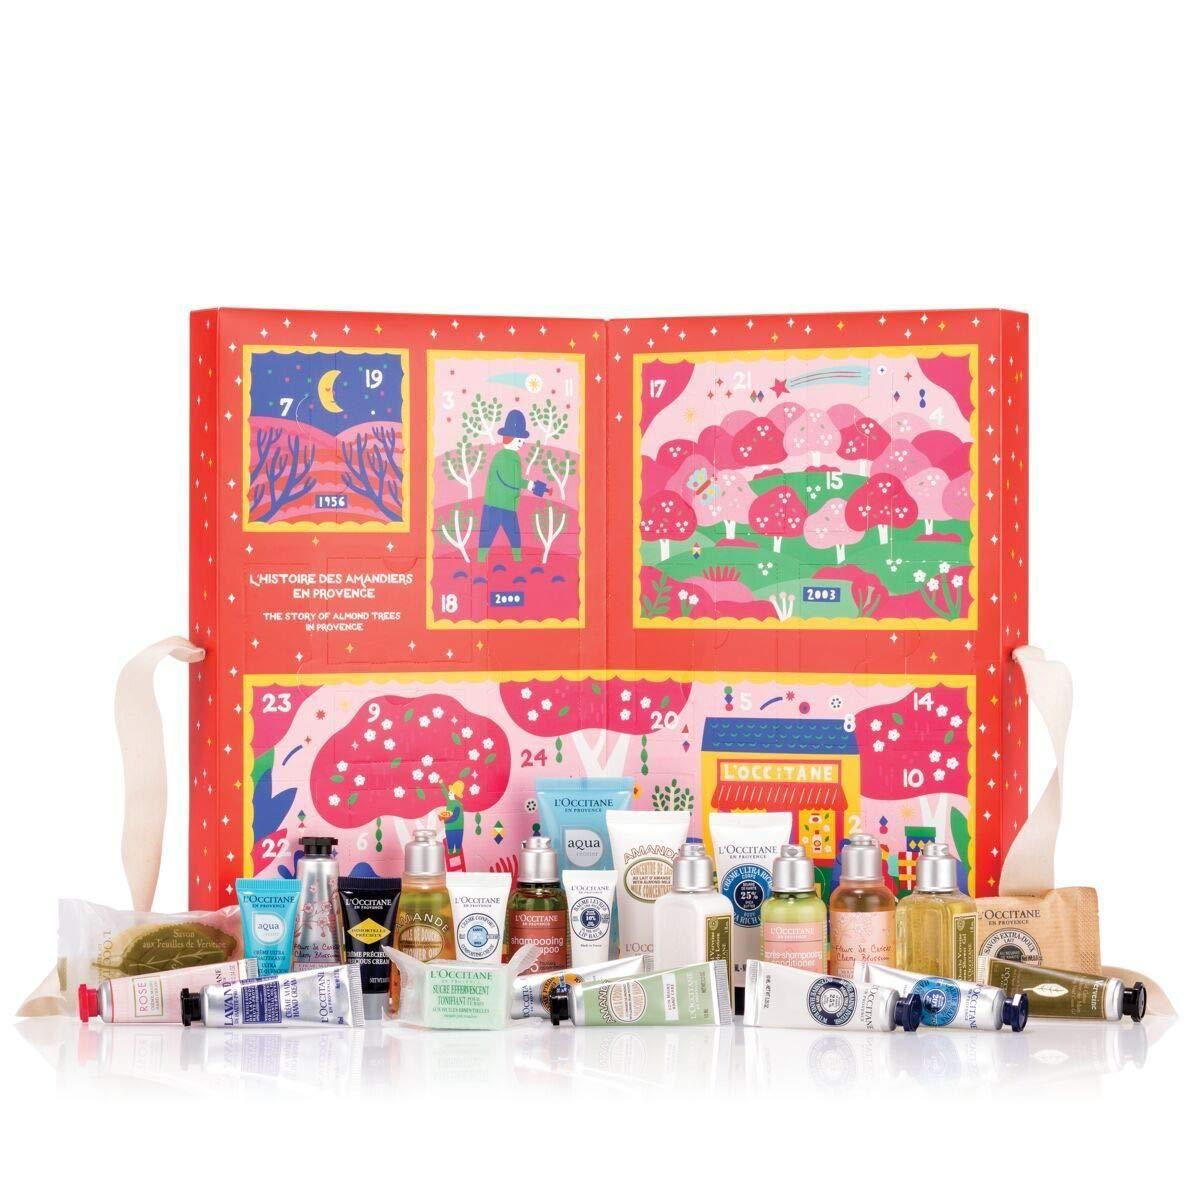 L Occitane Signature Holiday Advent Calendar Beauty Advent